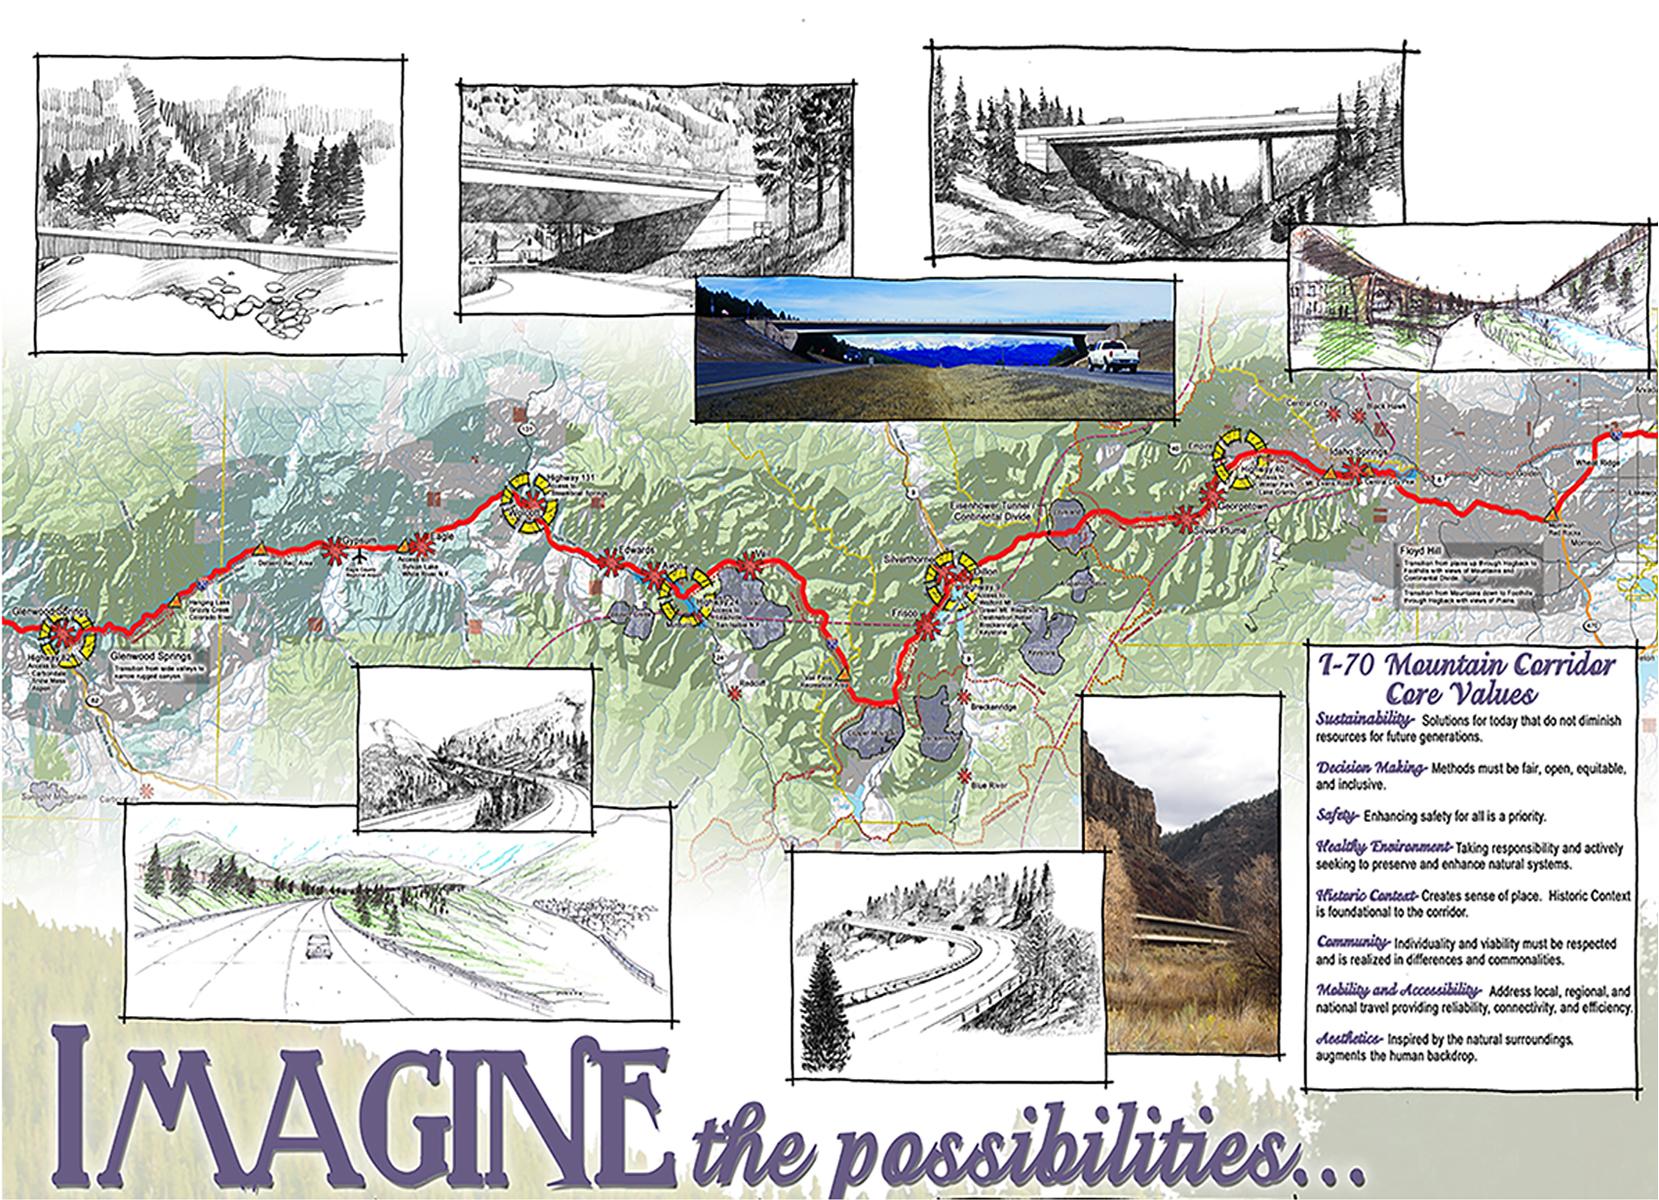 I-70 Mountain Corridor Aesthetic Guidance